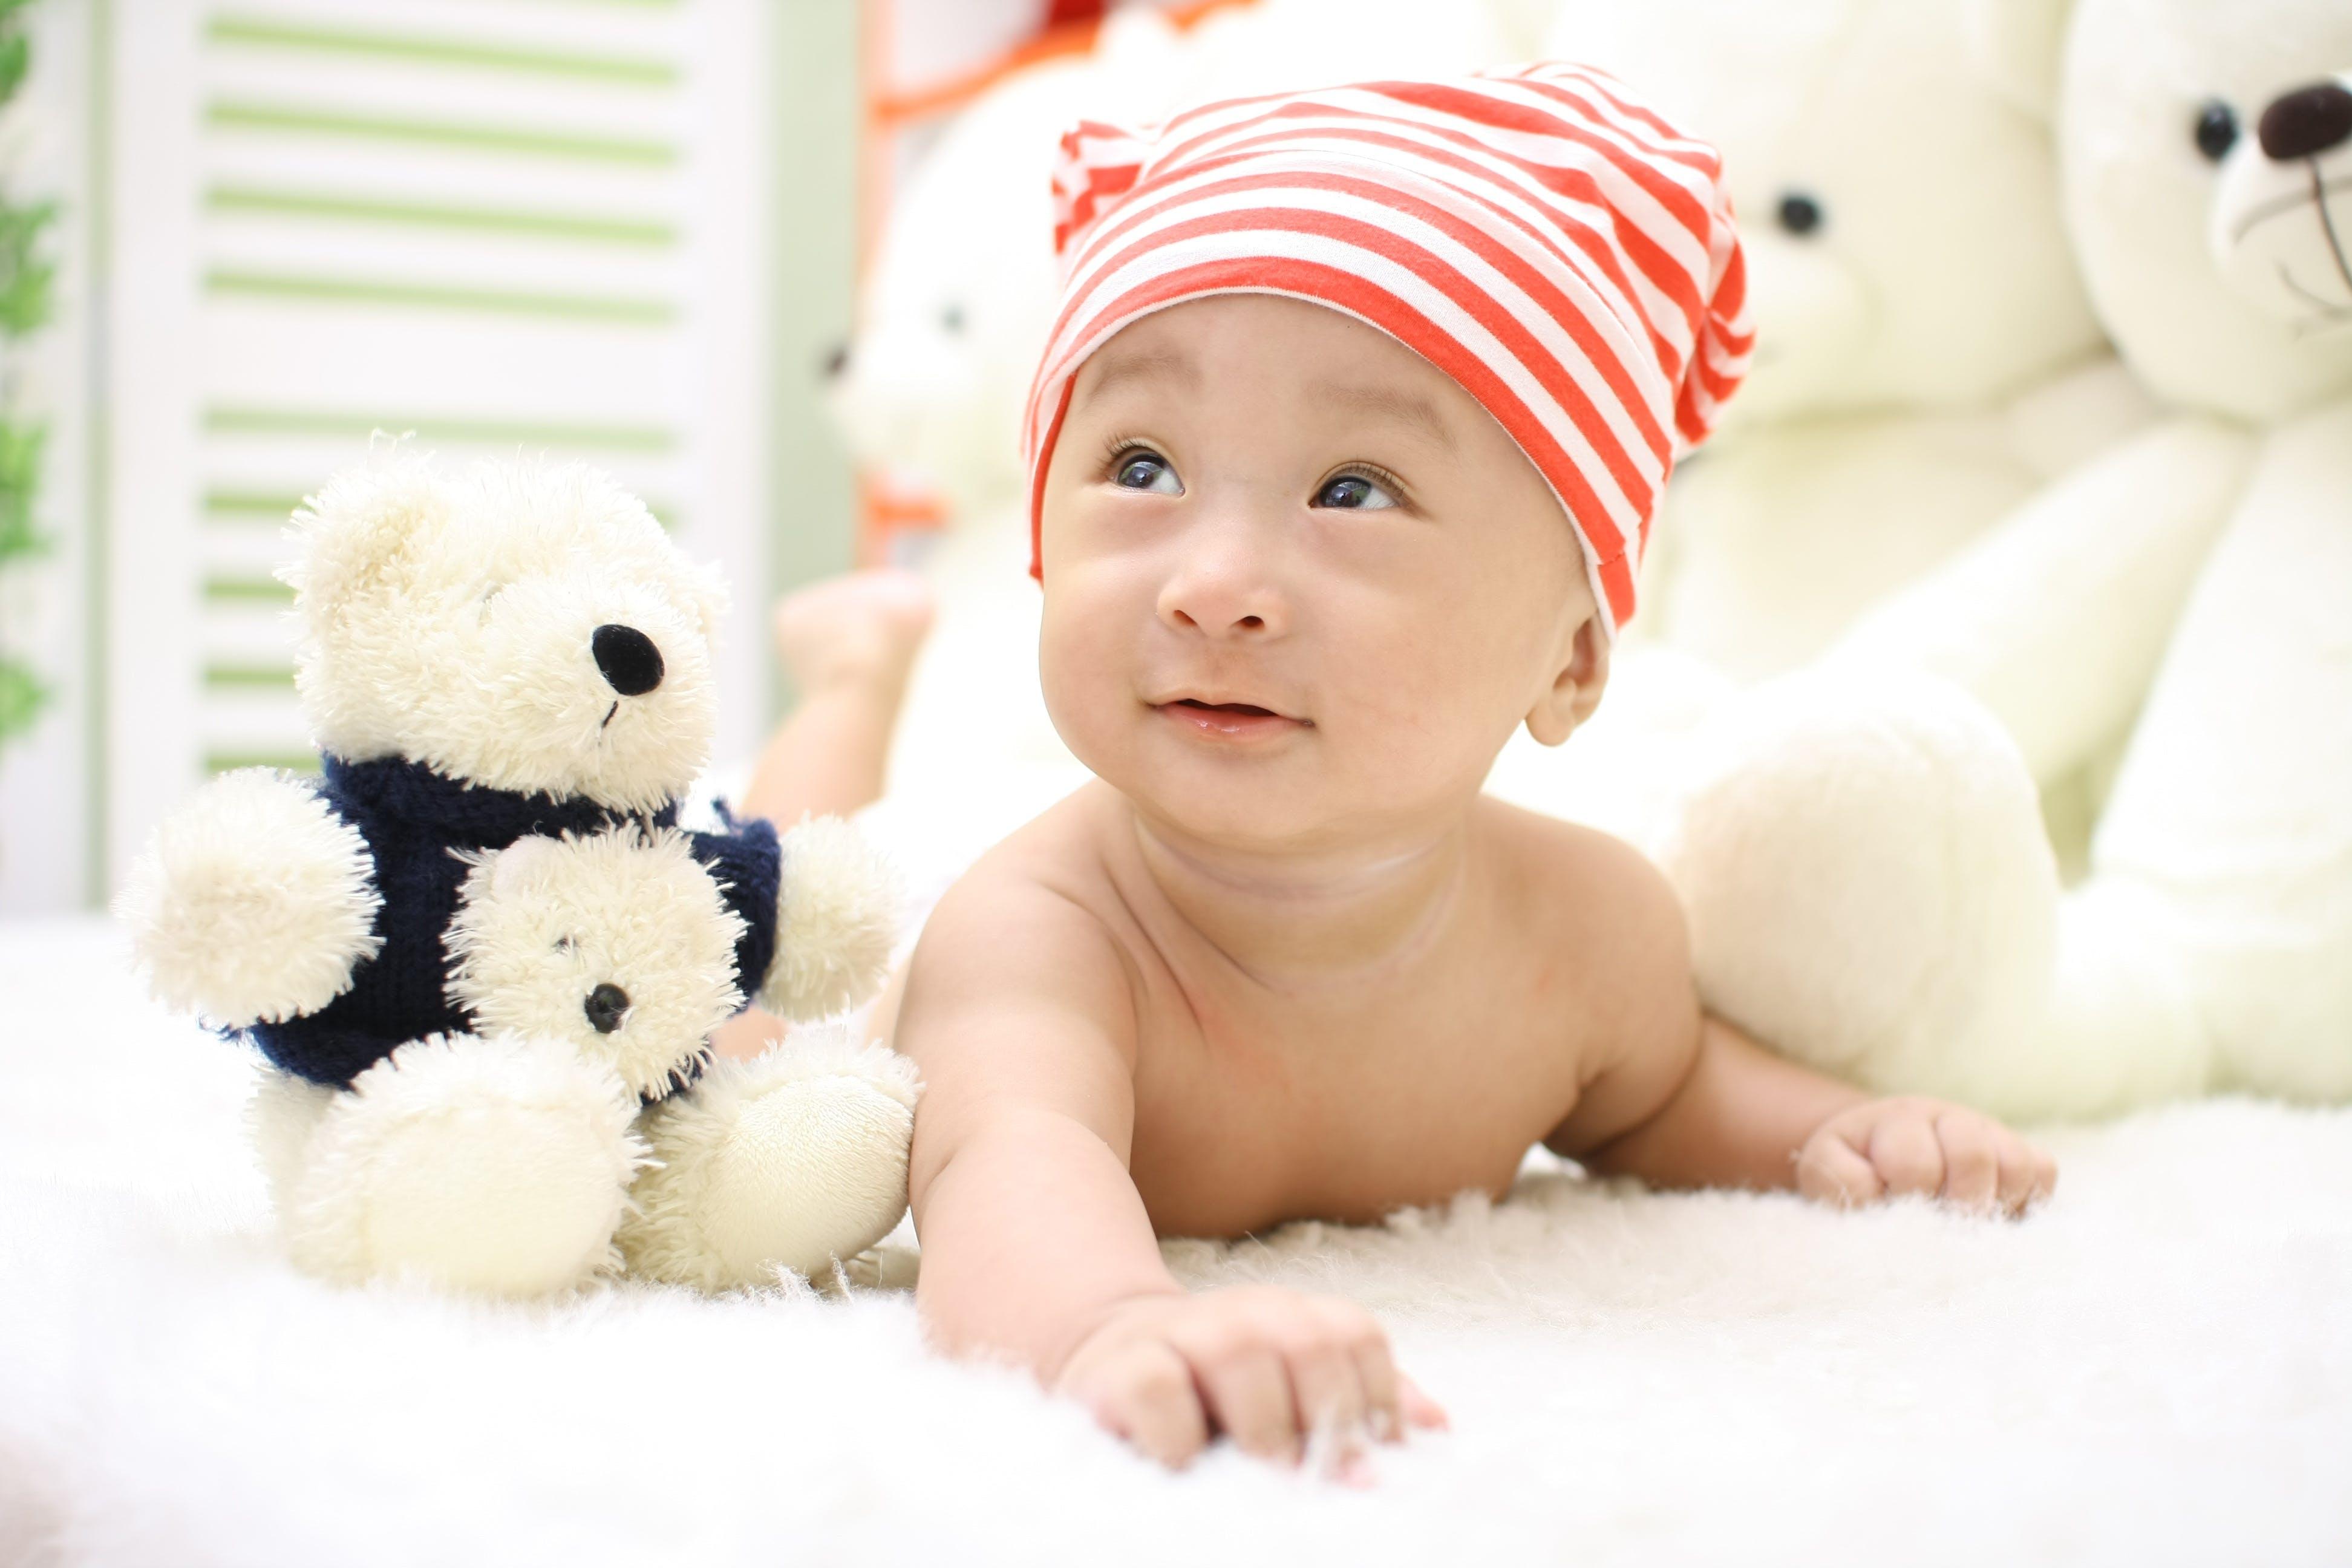 Smiling Toddler Wearing Orange and White Knit Cap Beside Black and White Bear Plush Toy